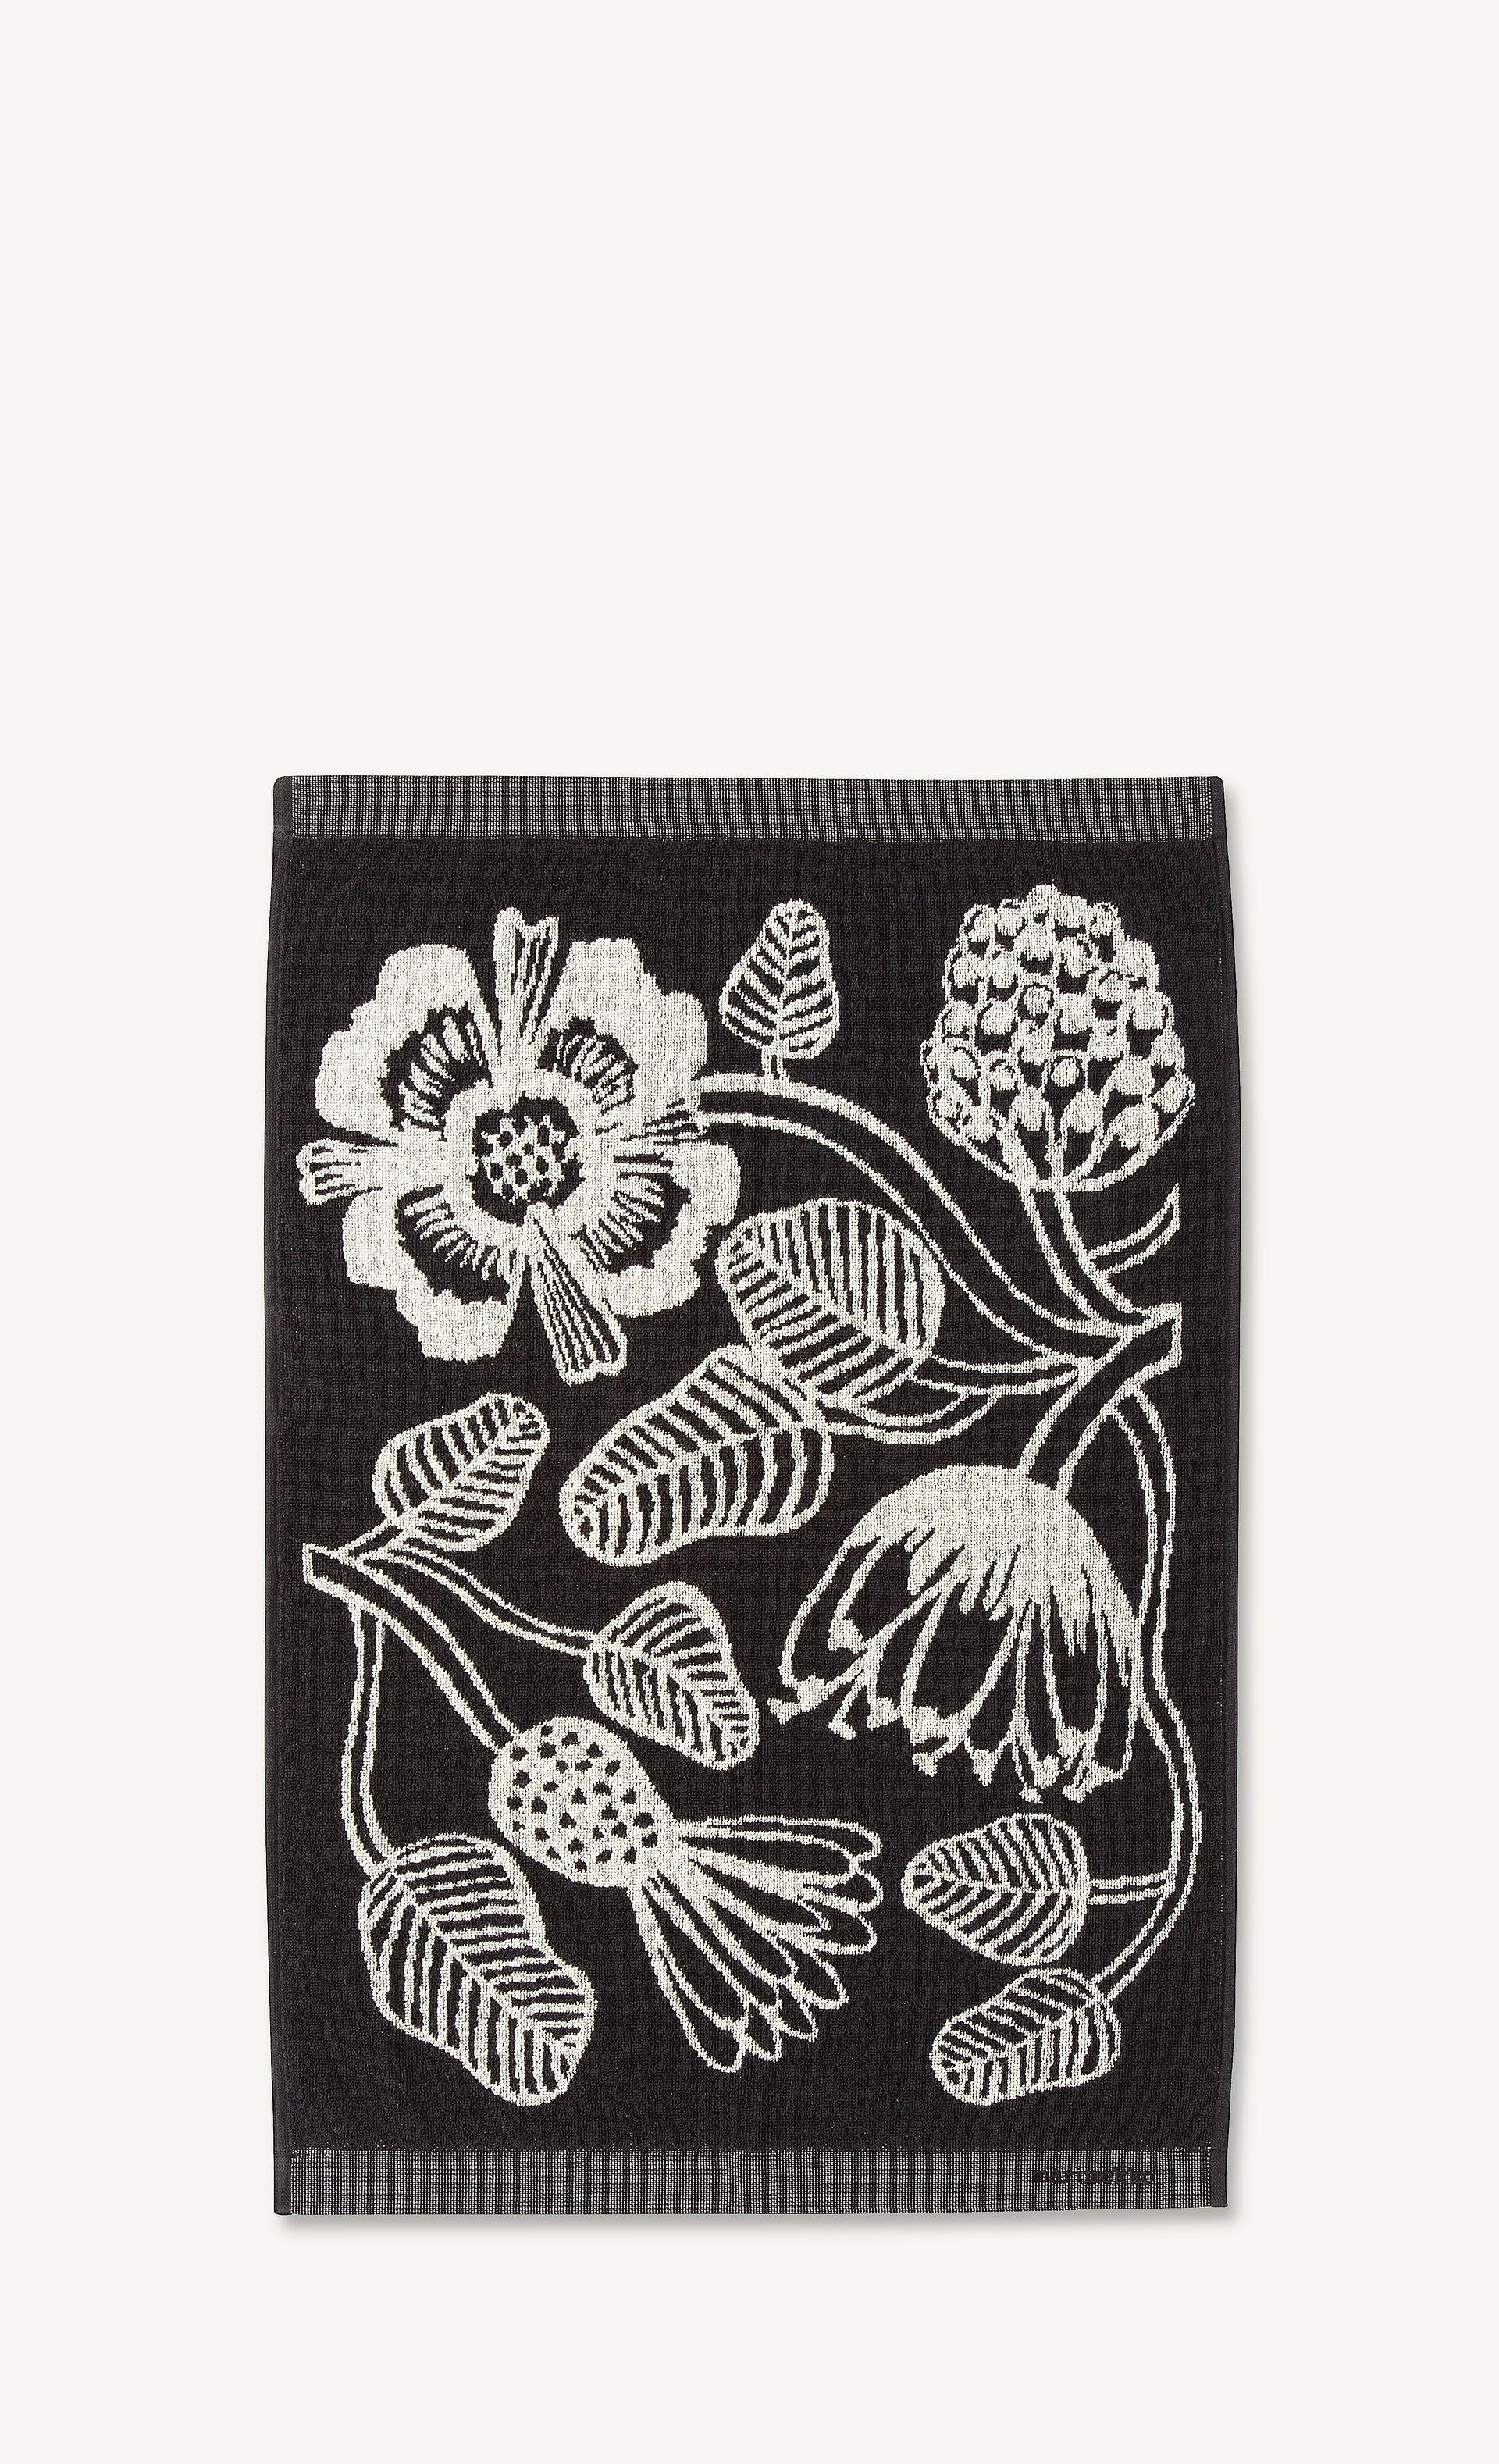 Tiara käsipyyhe valkoinen musta hand towels and towels